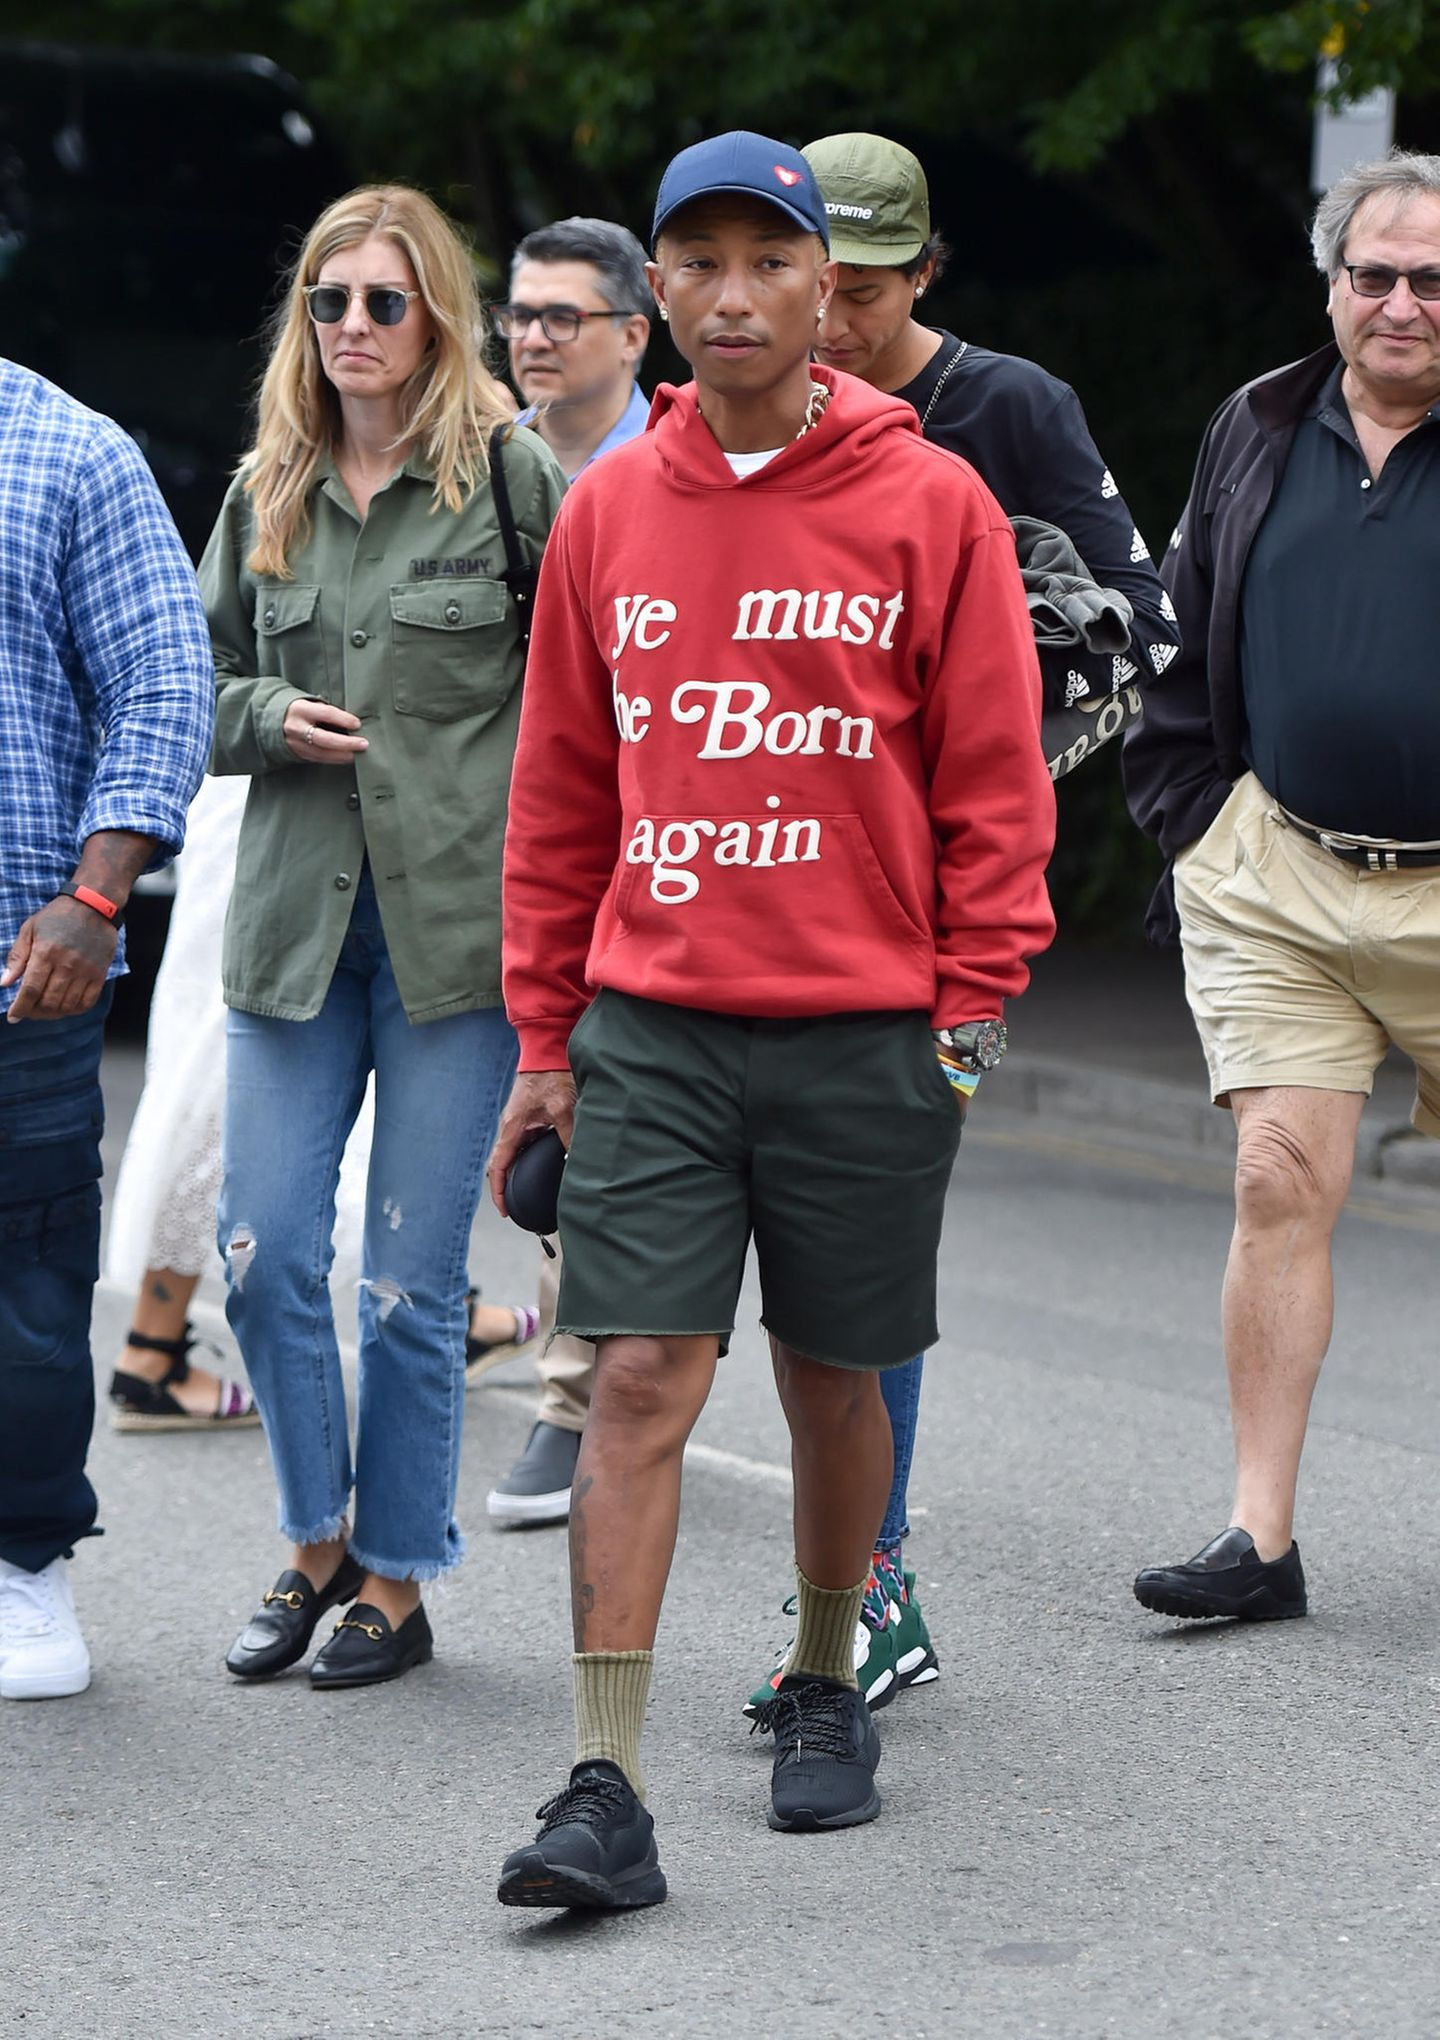 13. Juli 2019  Pharrell Williams ist ein großer Tennis-Fan. Sonst drückt er Rafael Nadal die Daumen. Heute jedoch wünscht er den beiden Finalistinnen viel Glück.